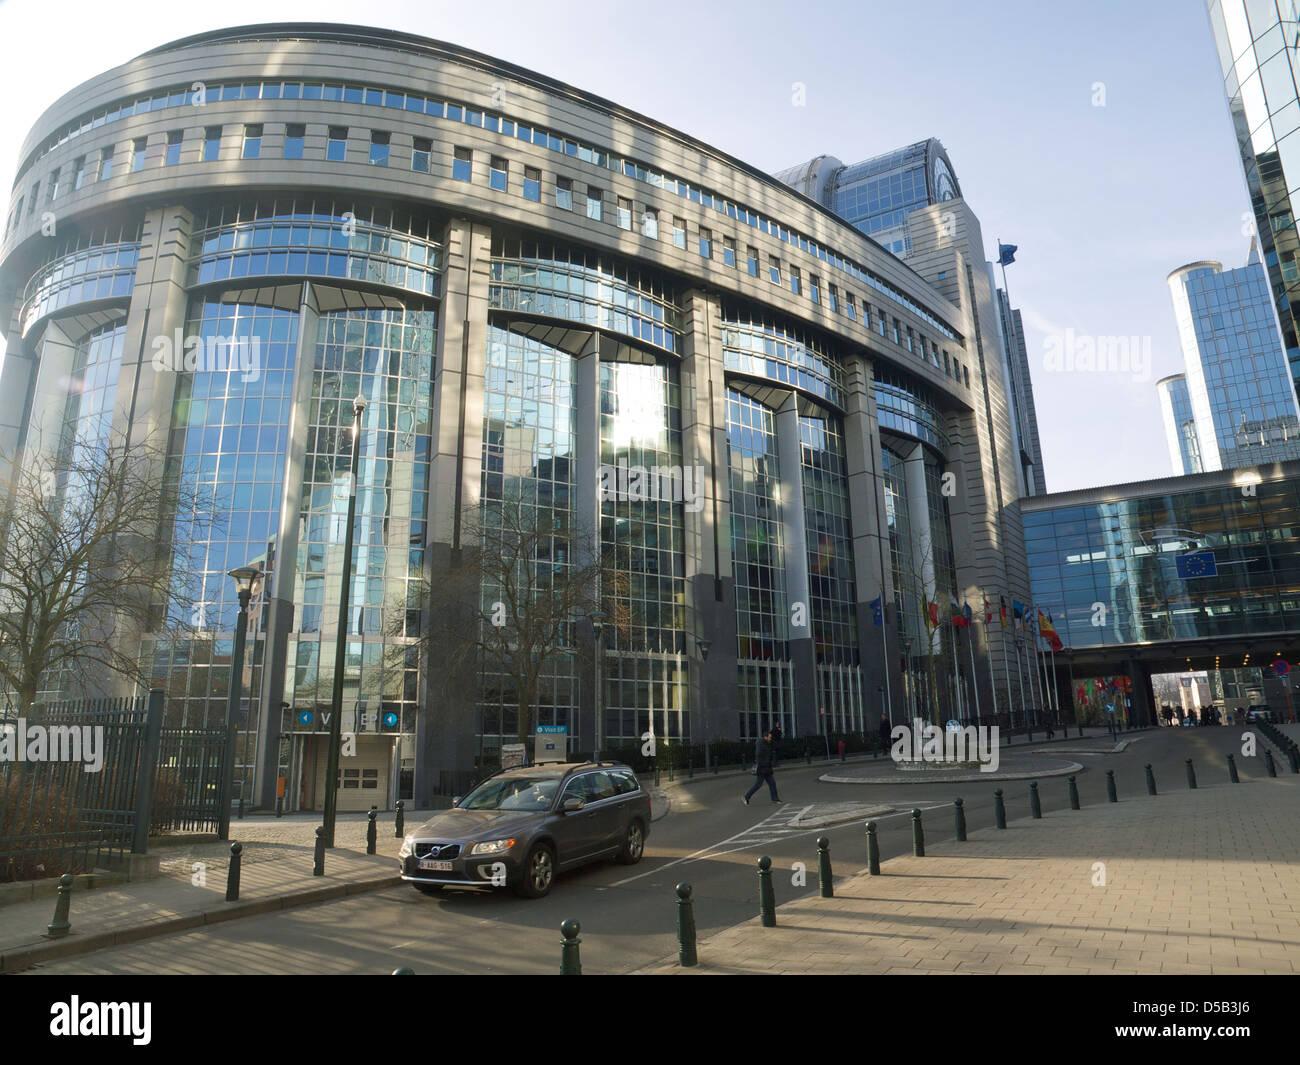 The European Parliament building in Brussels, Belgium - Stock Image